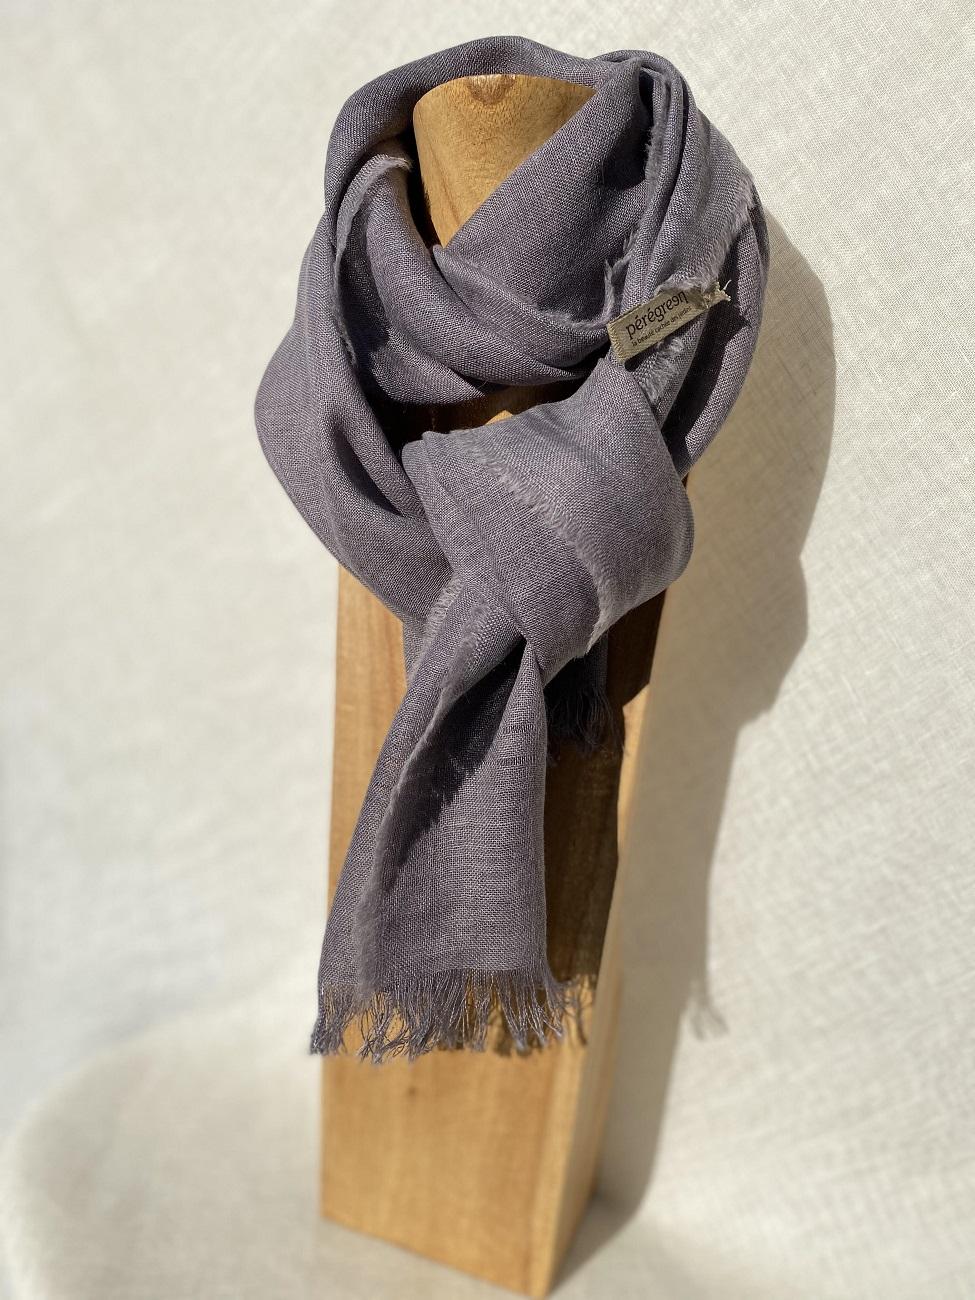 Petit foulard bleu lin alpaga - couleur et teinture naturelle